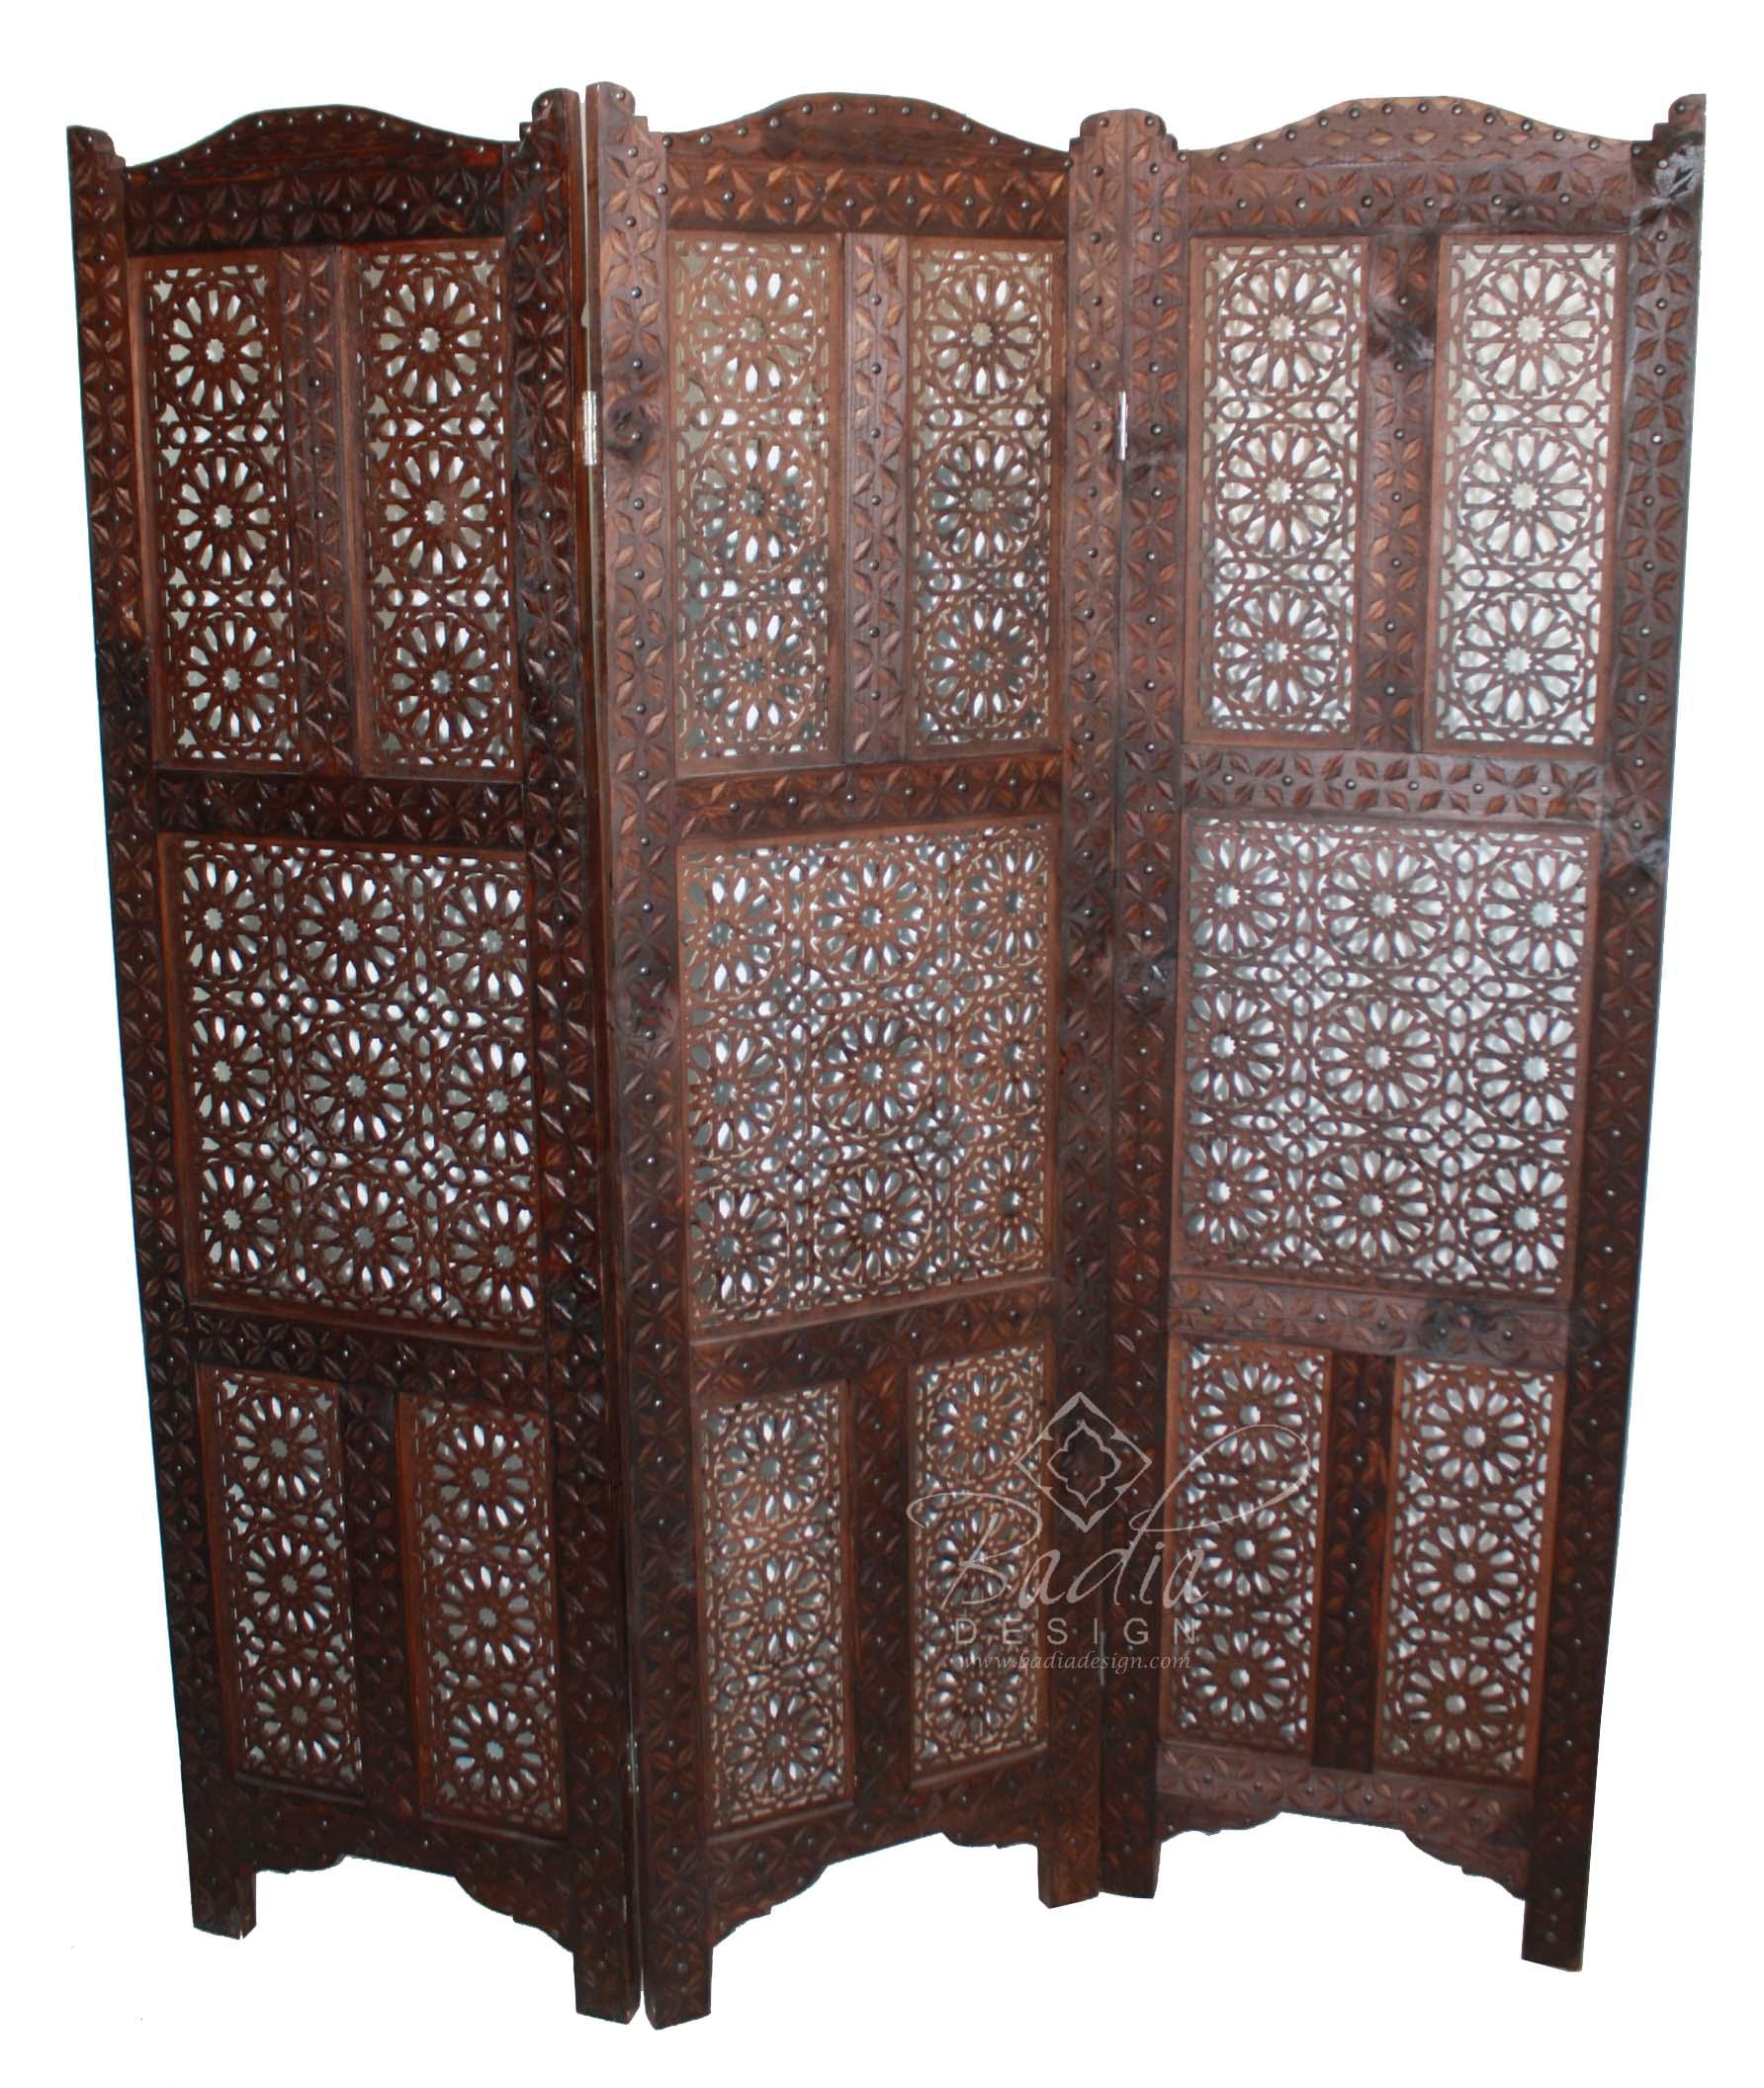 moroccan-hand-carvedwooden-screen-divider-wpn-018.jpg